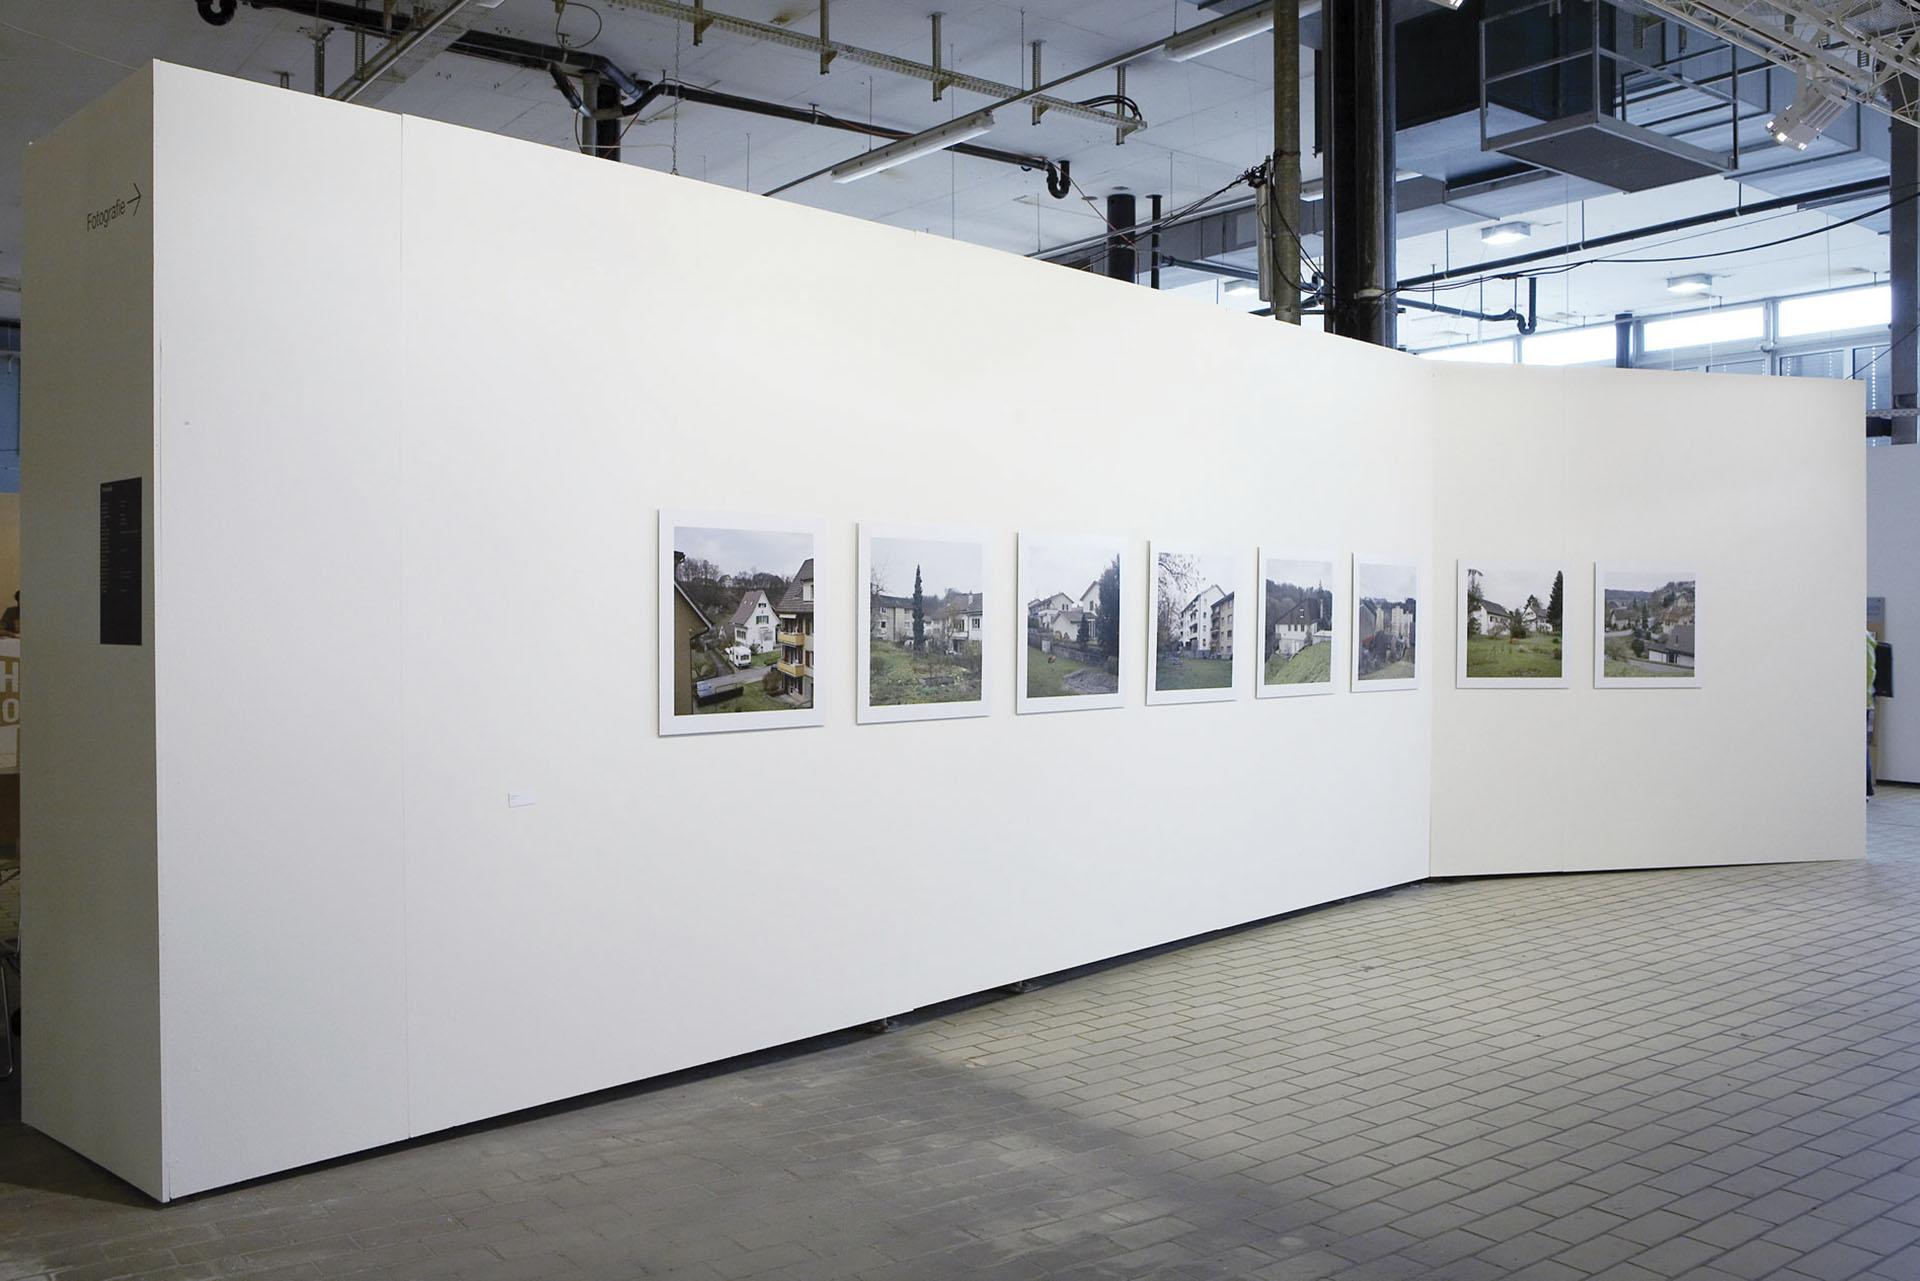 Fotoserie Sonntag | Toni Areal, Zürich | 2007